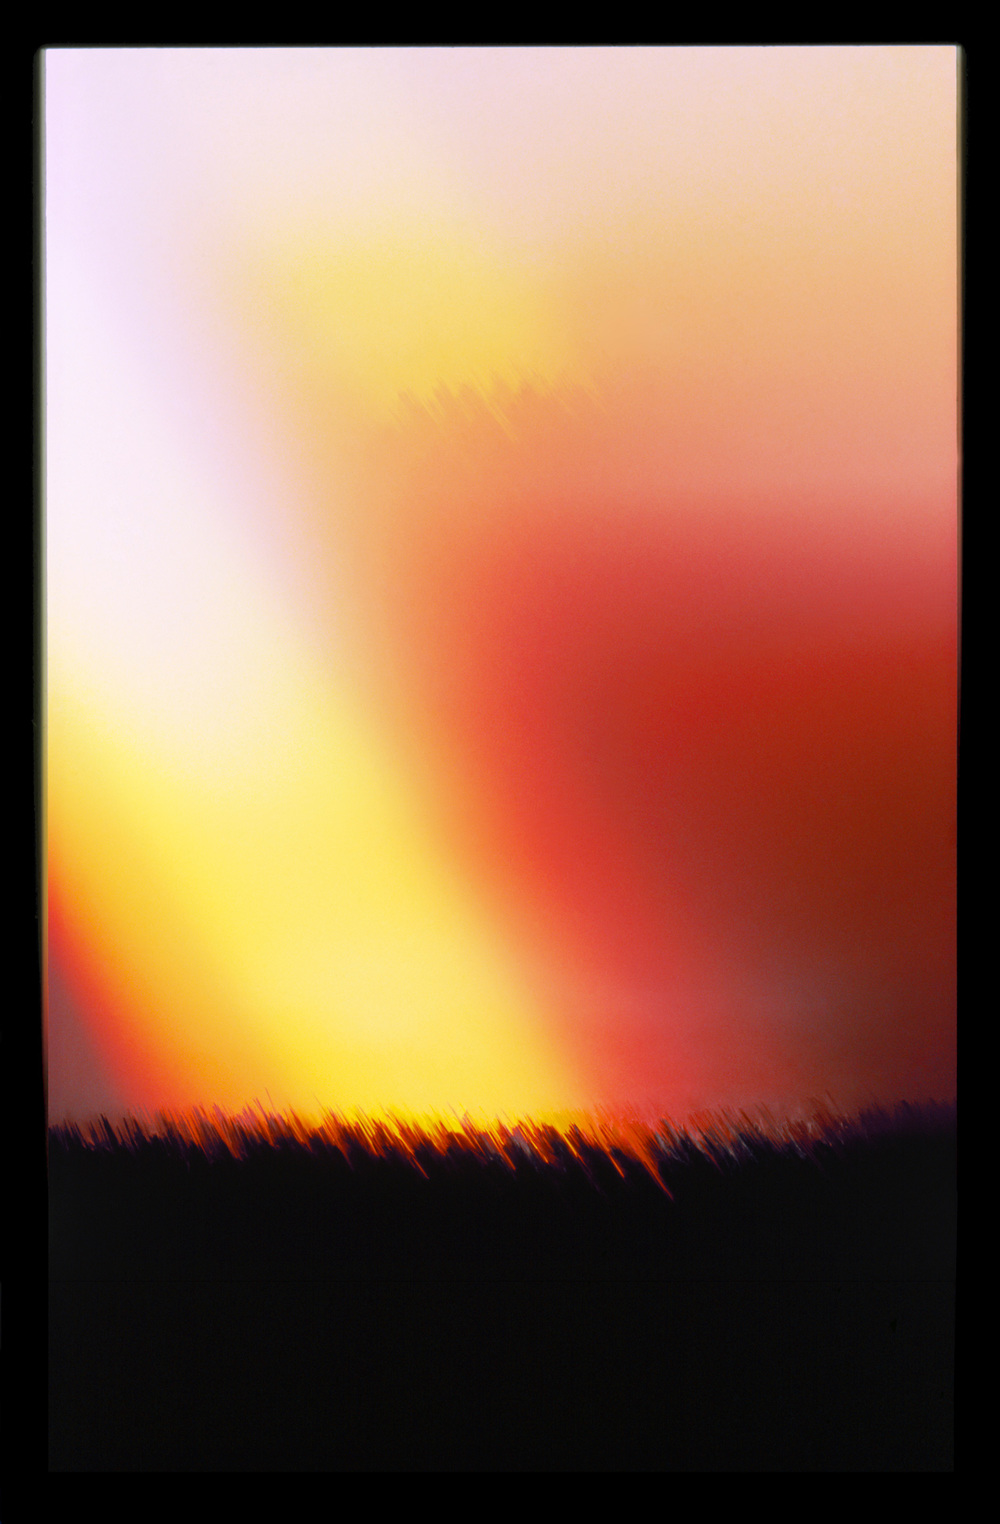 Endings - Kodachrome 64, No.37. 26/05/1978